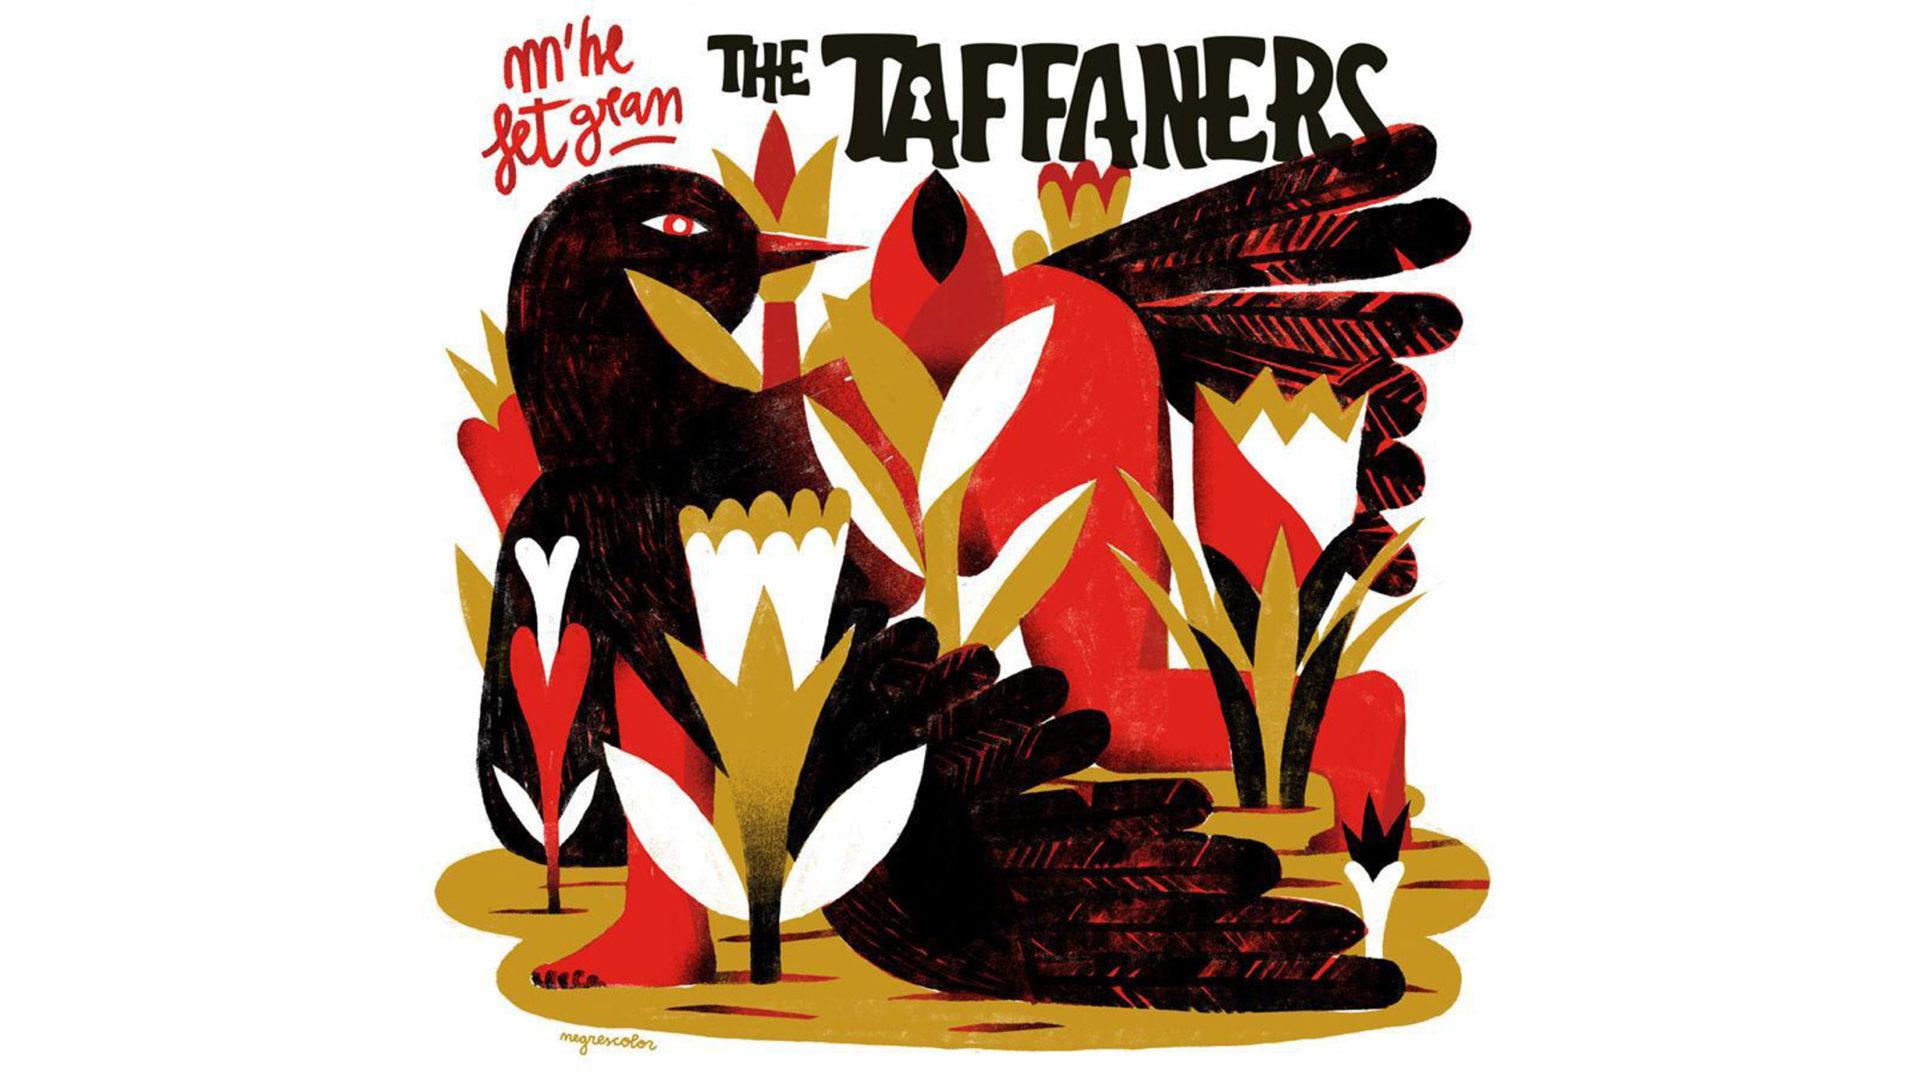 The Taffaners